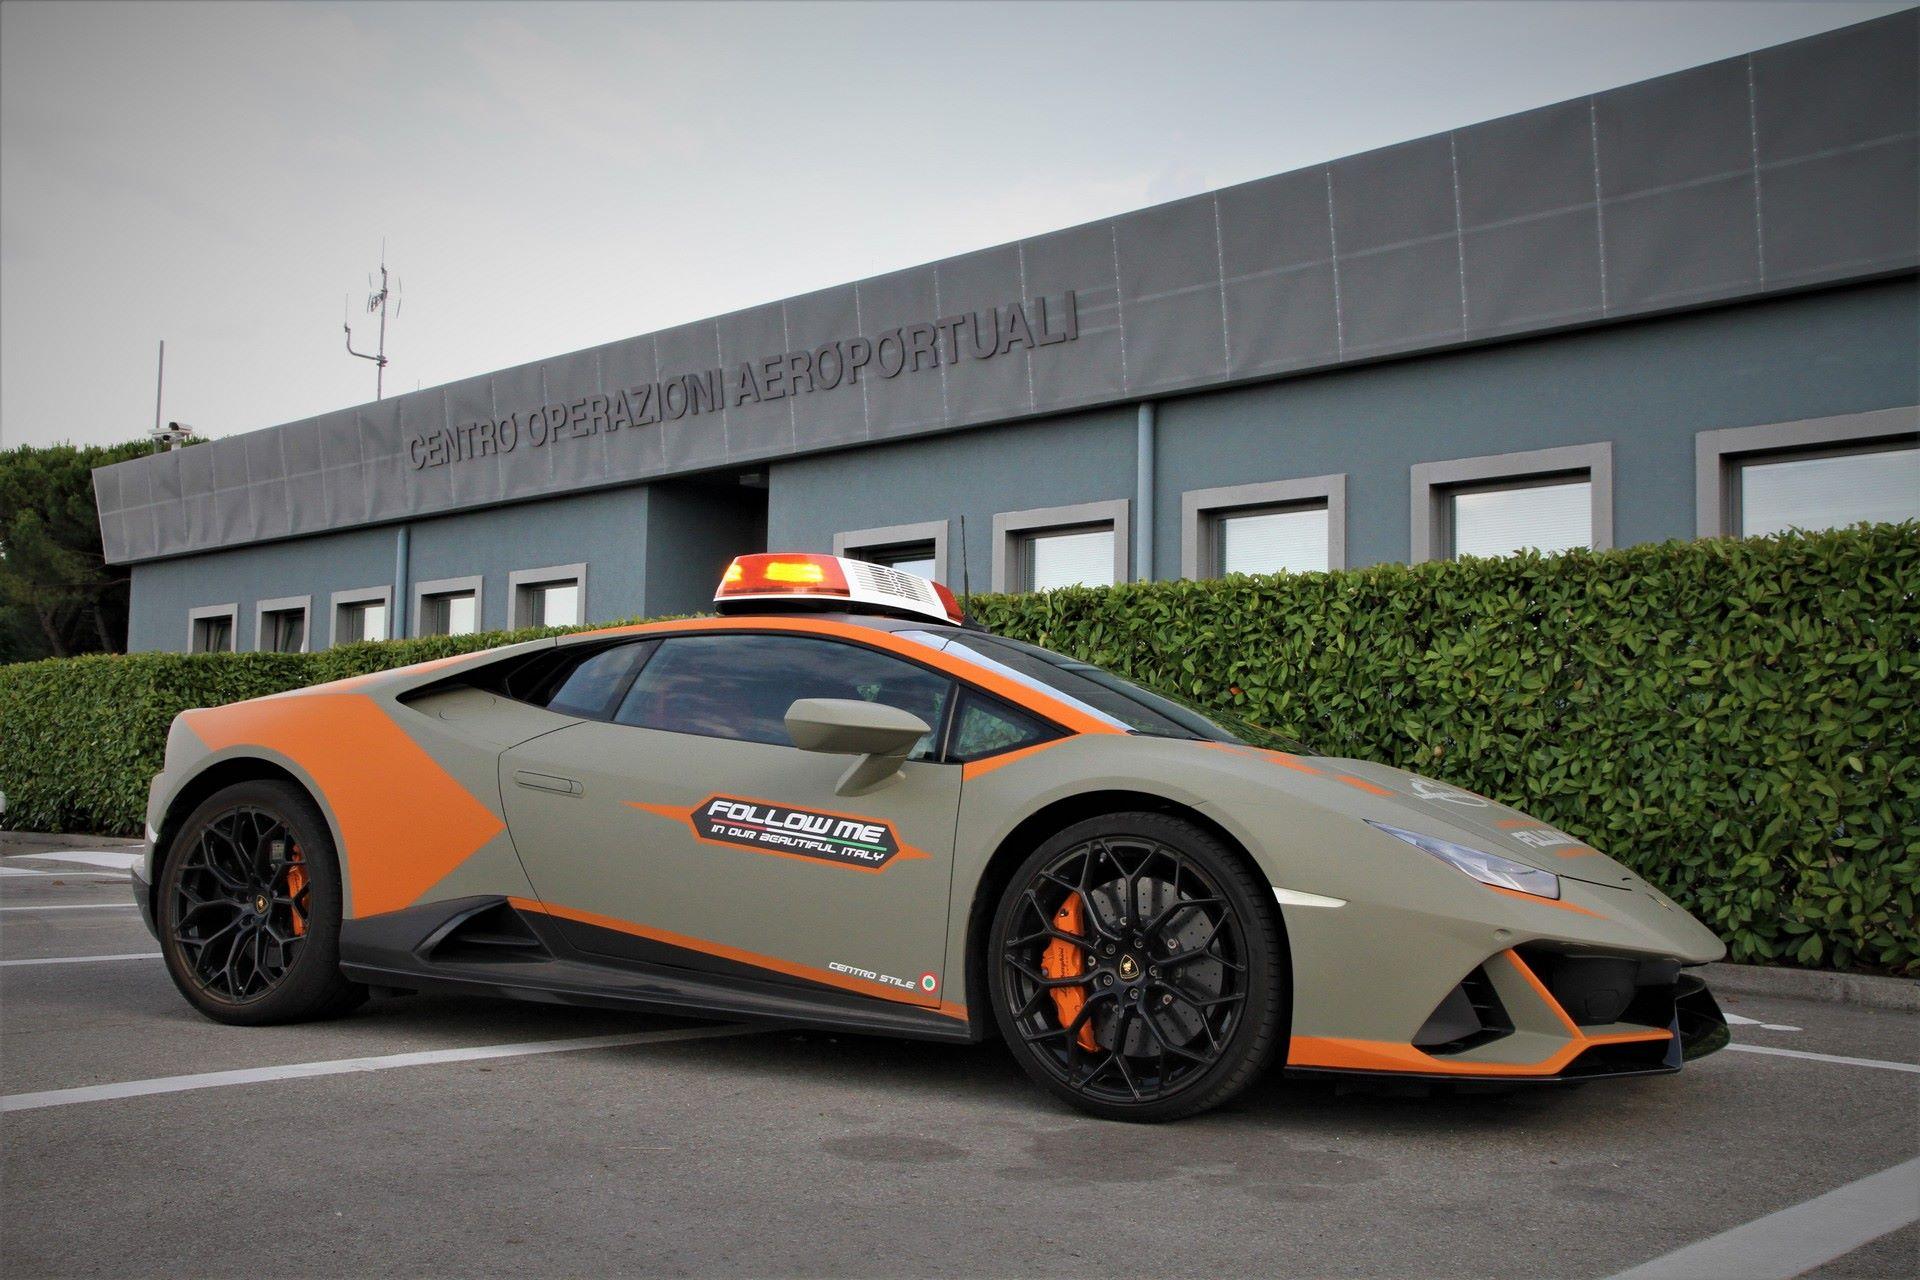 Lamborghini-Huracan-Evo-Follow-Me-bologna-airport-2021-5